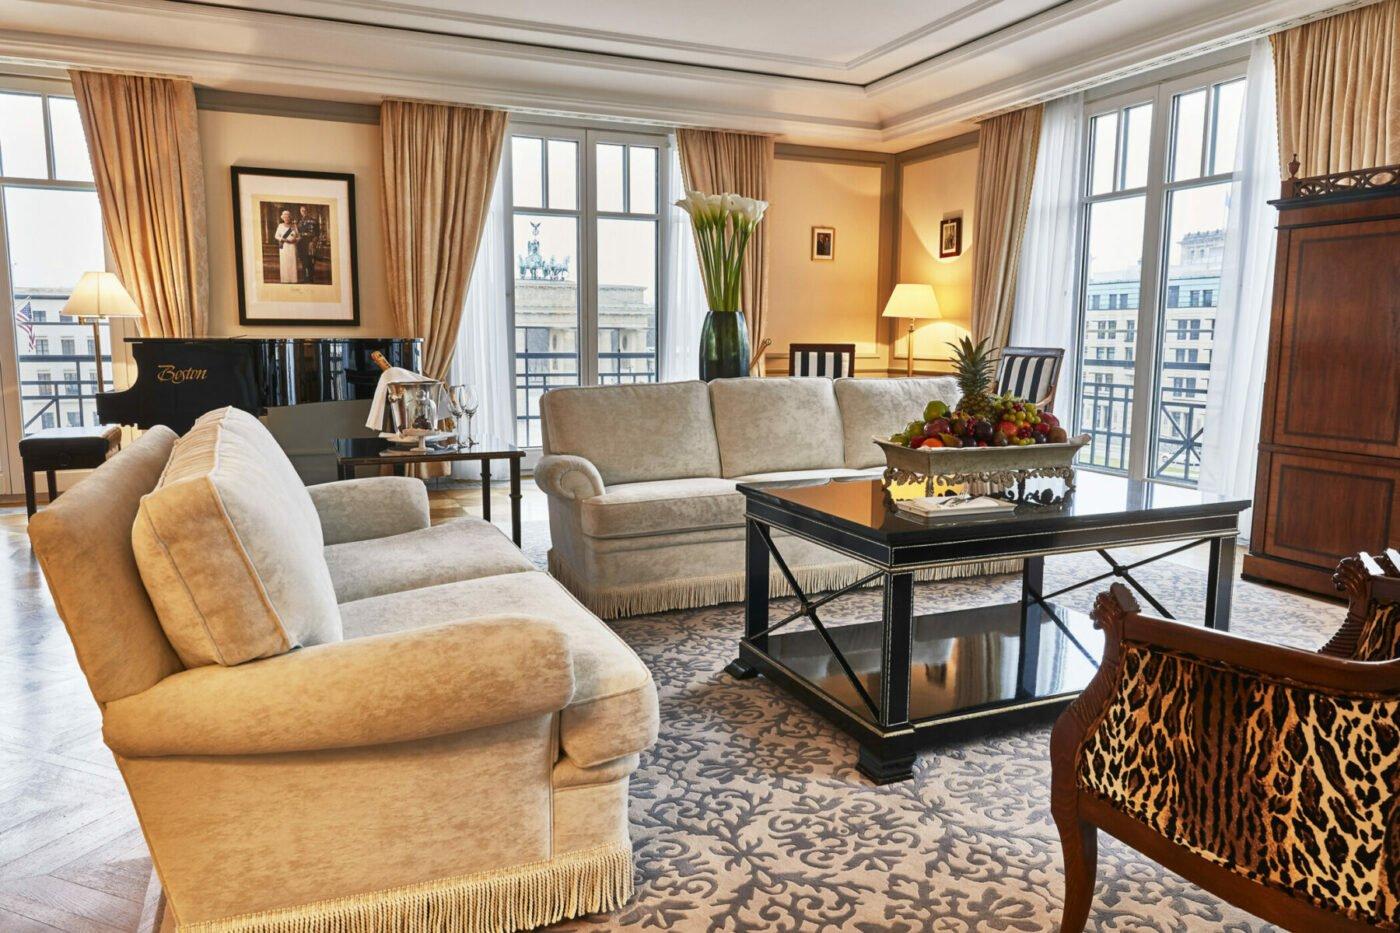 Hotel Adlon Room